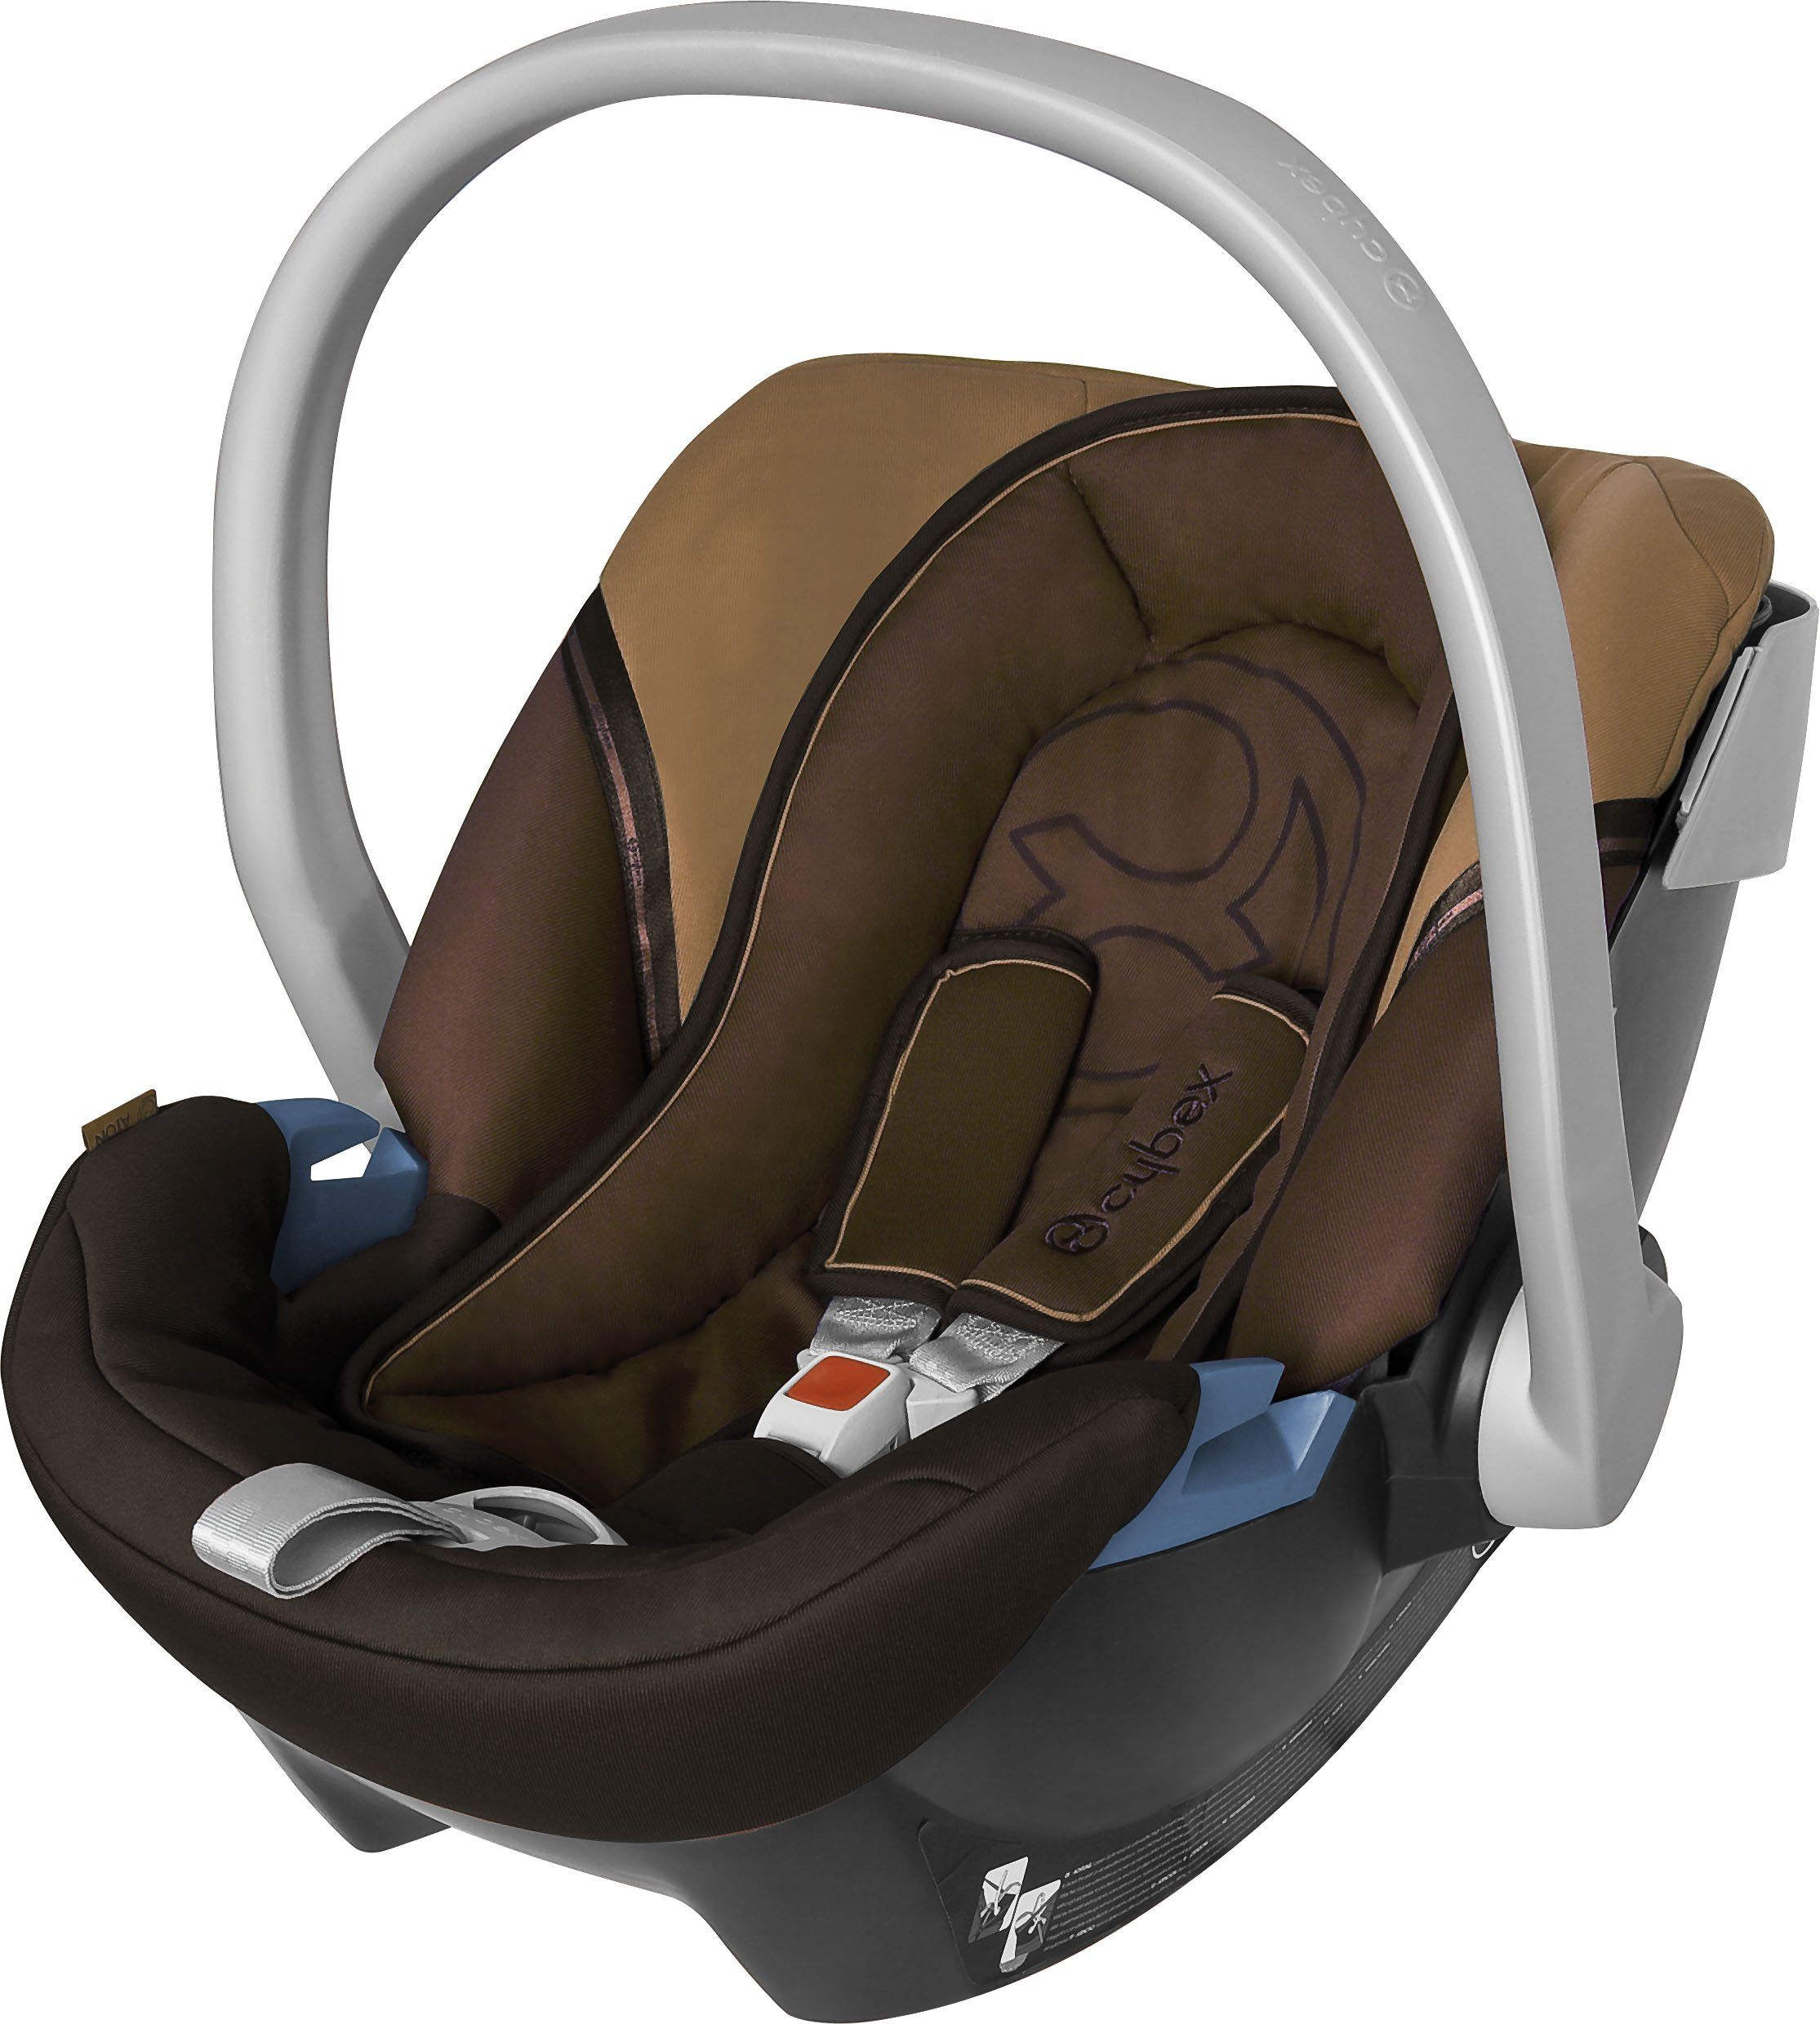 Bezug f/ür Babyschale Komplett-Set EULE $12//DUNKELGRAU BAMBINIWELT Ersatzbezug f/ür Maxi-Cosi CabrioFix 6-tlg